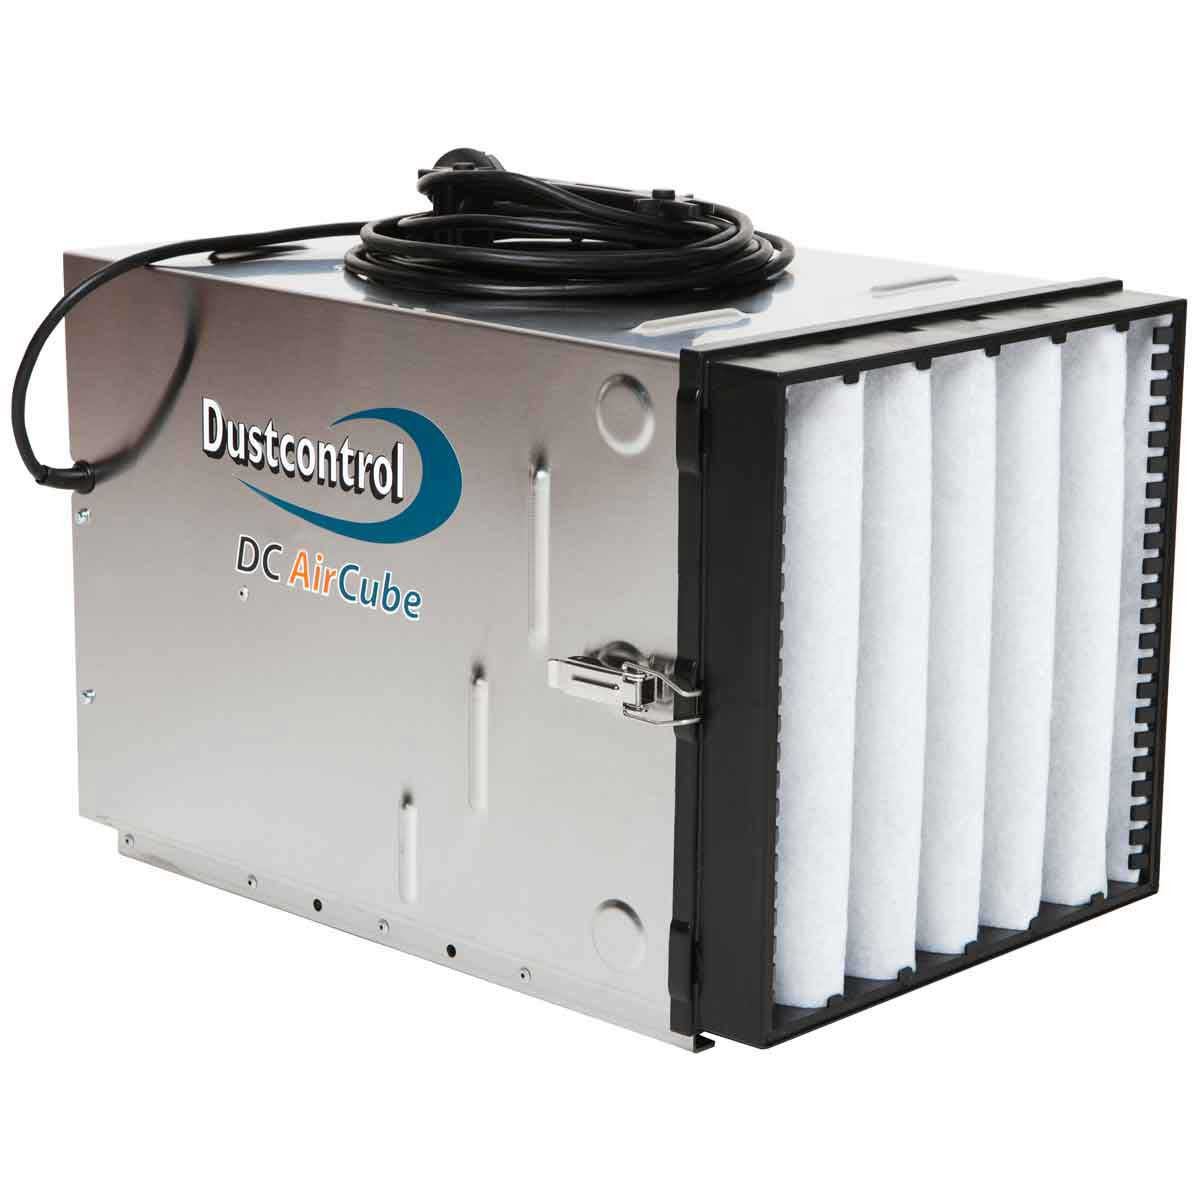 DustControl DC AirCube 500 115V